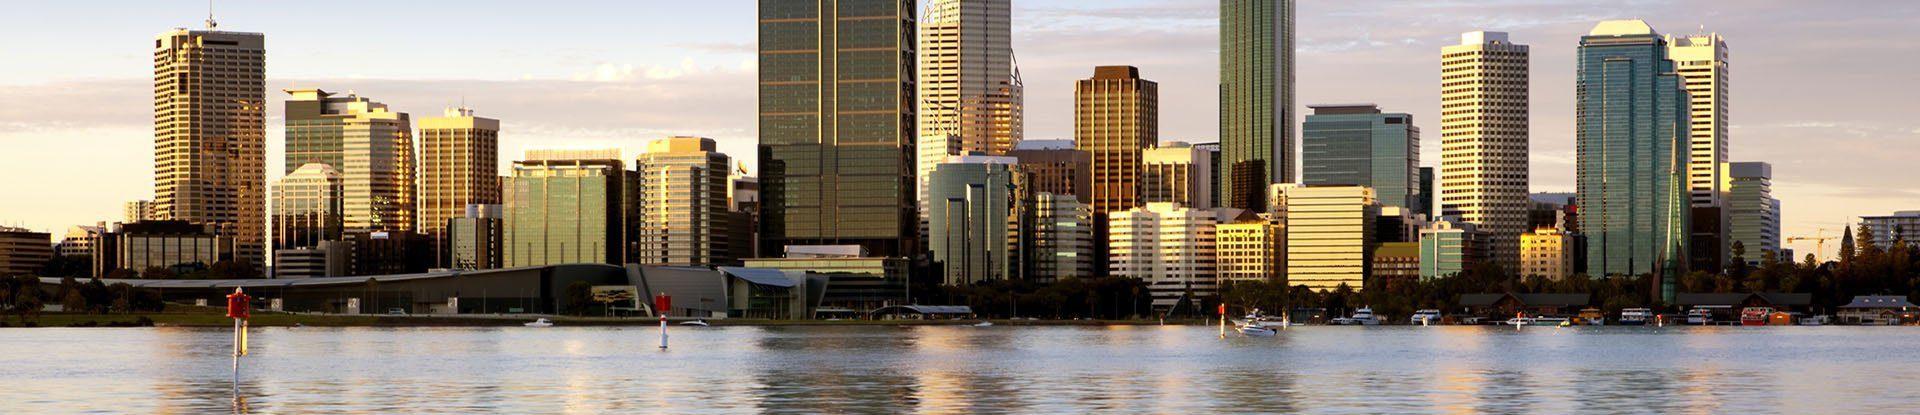 Perth banner 2 1